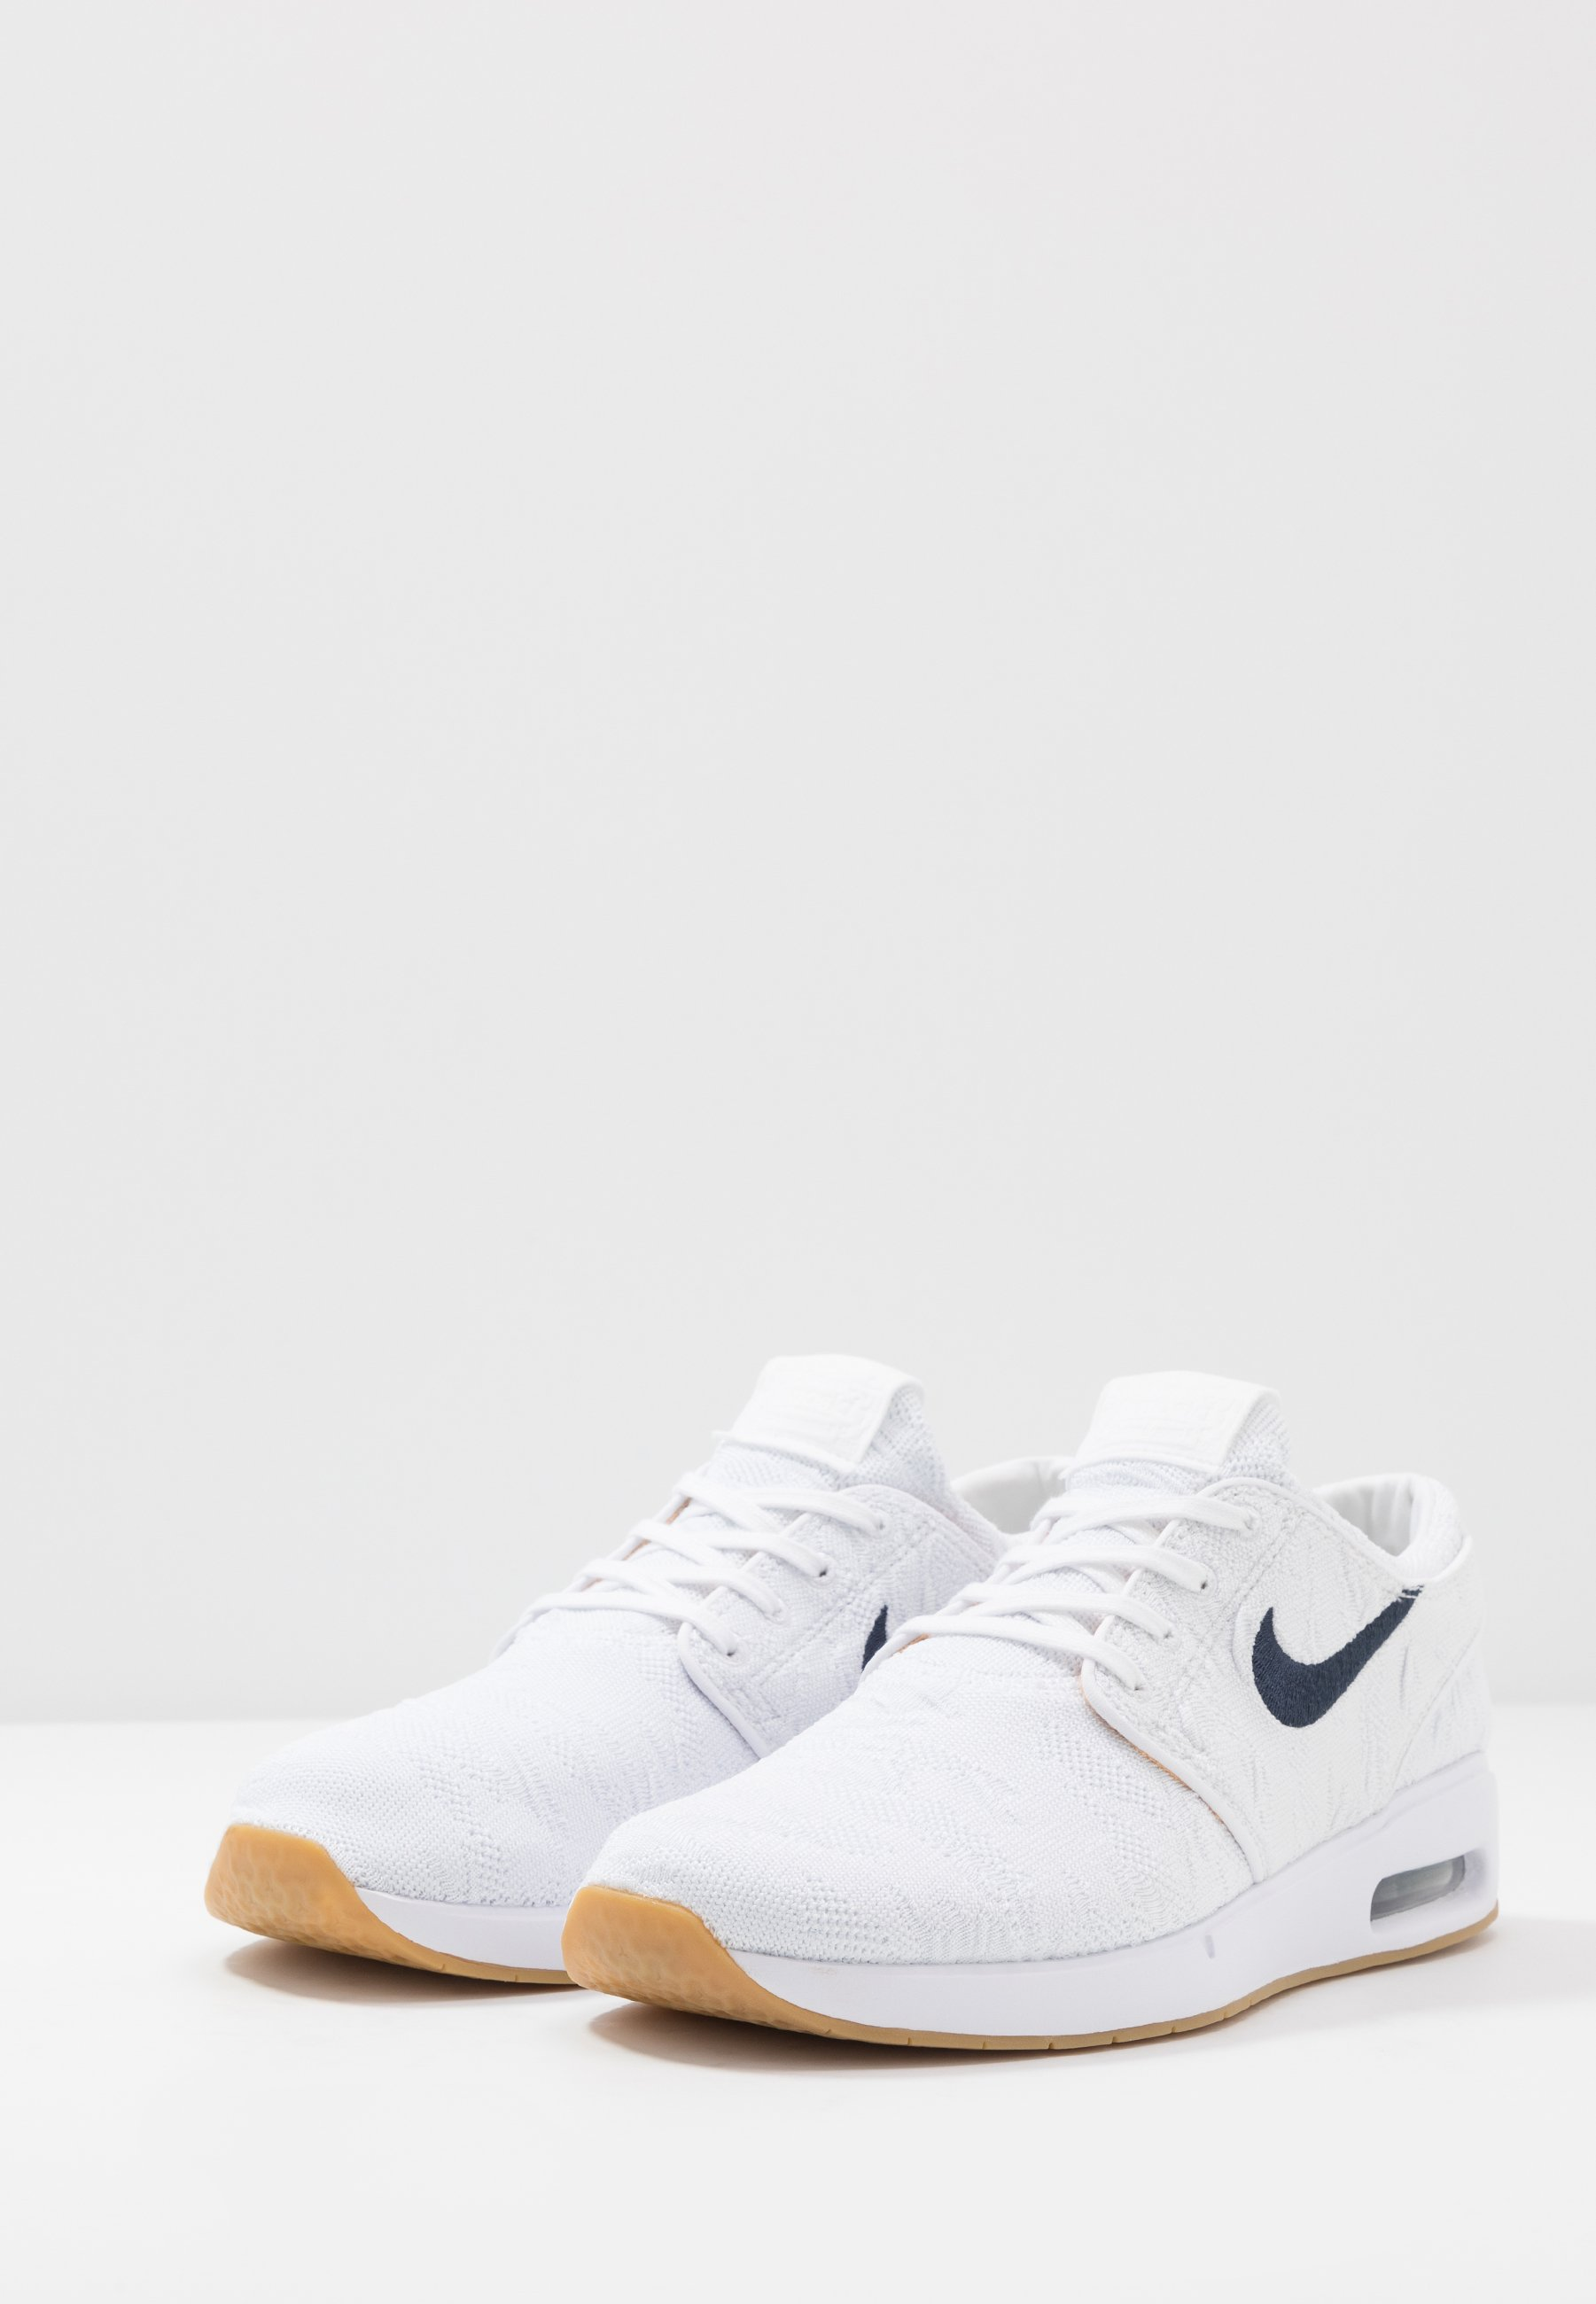 Geringster Preis Nike SB JANOSKI MAX - Sneaker low - white/obsidian/celestial gold/light brown | Damenbekleidung 2020